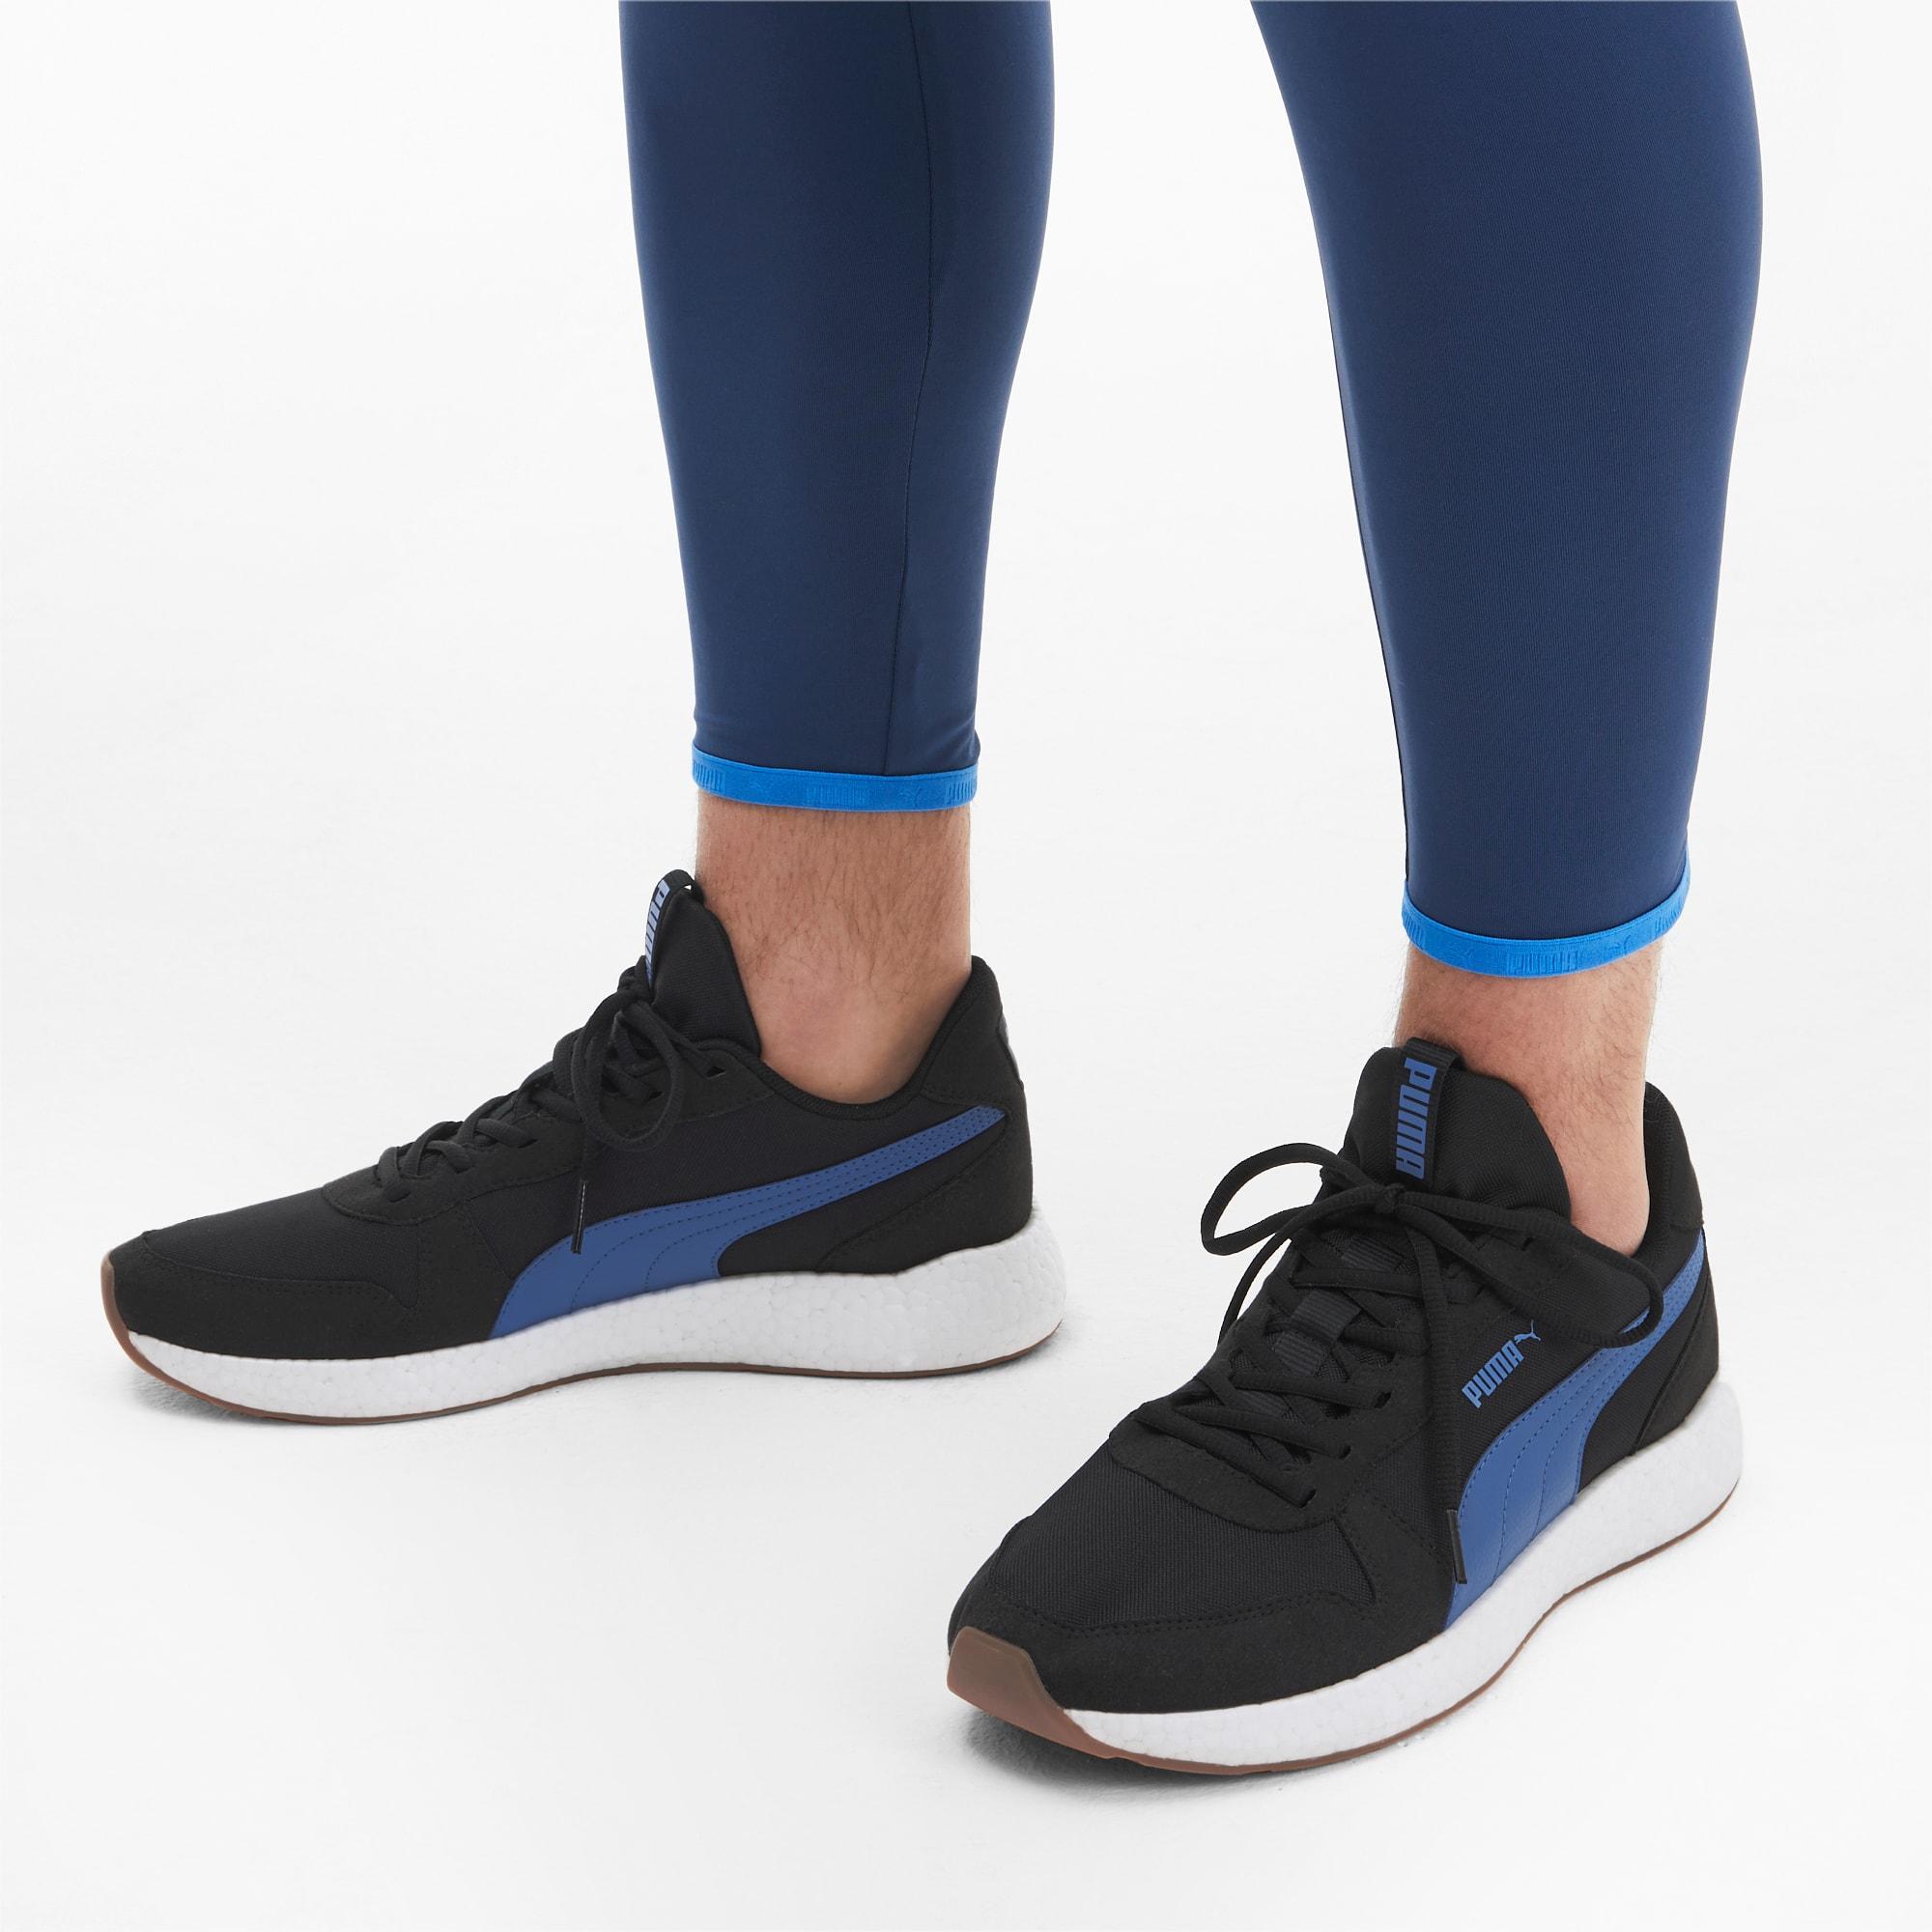 NRGY Neko Retro Men's Running Shoes